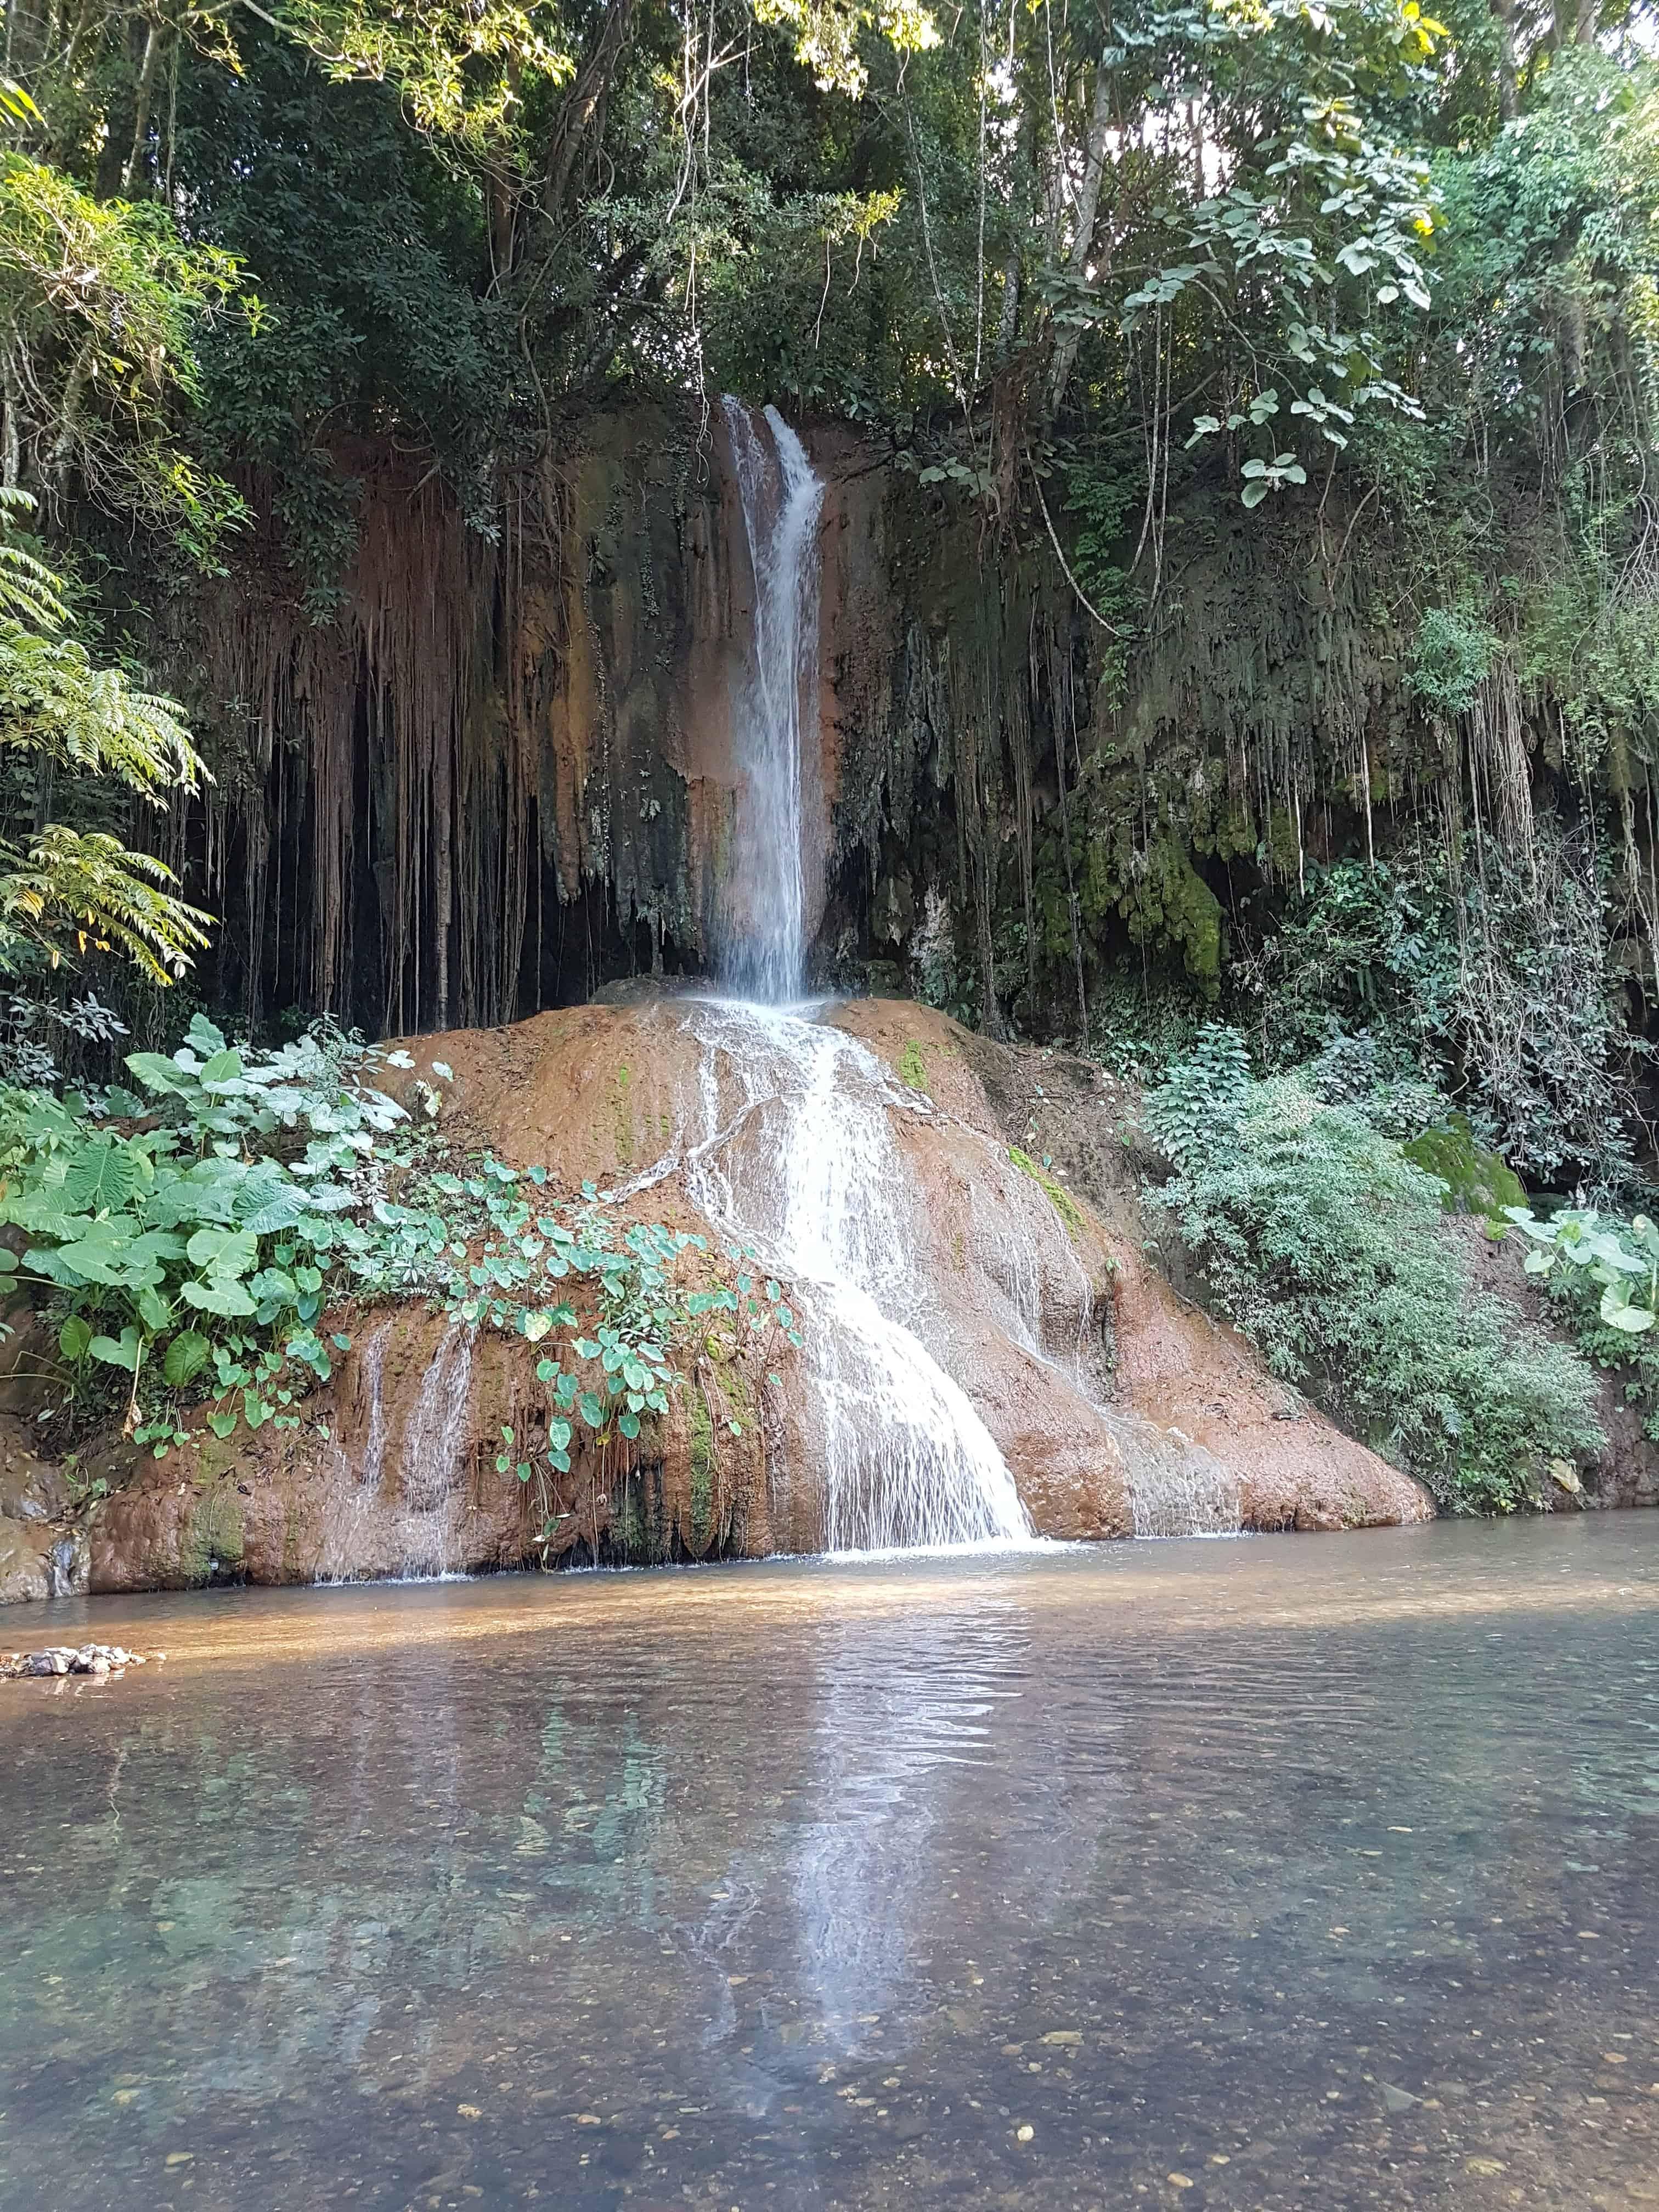 Thaïlande, aujourd'hui on va au Laos... ou pas ?! ⛔ 4